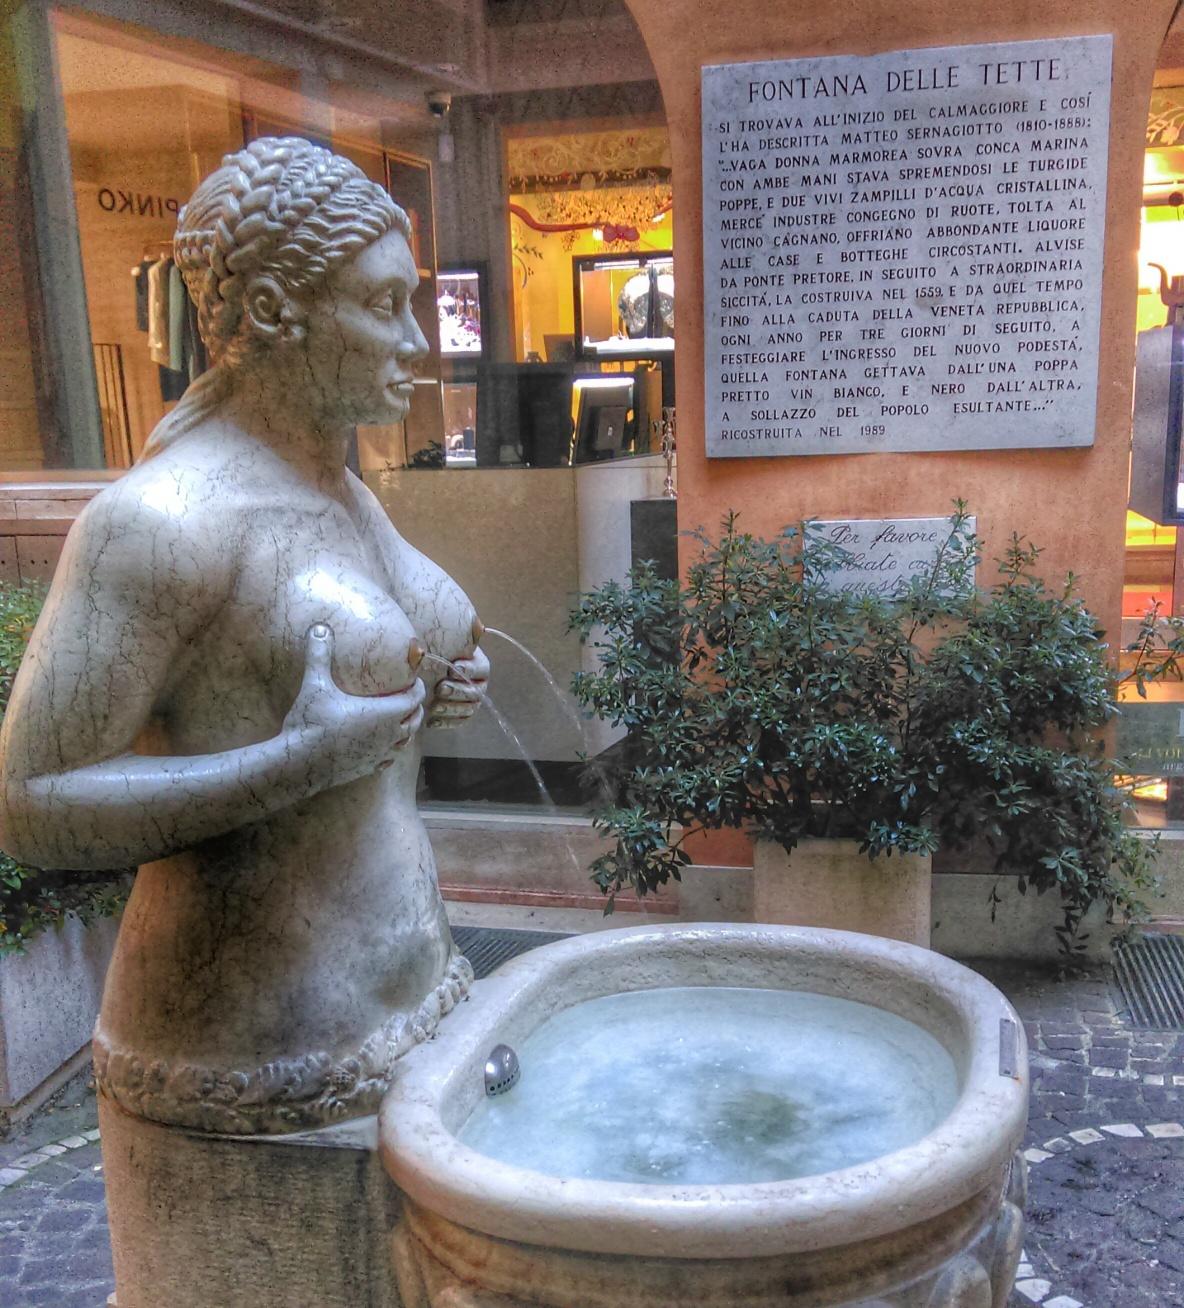 Fontana delle tette a Treviso